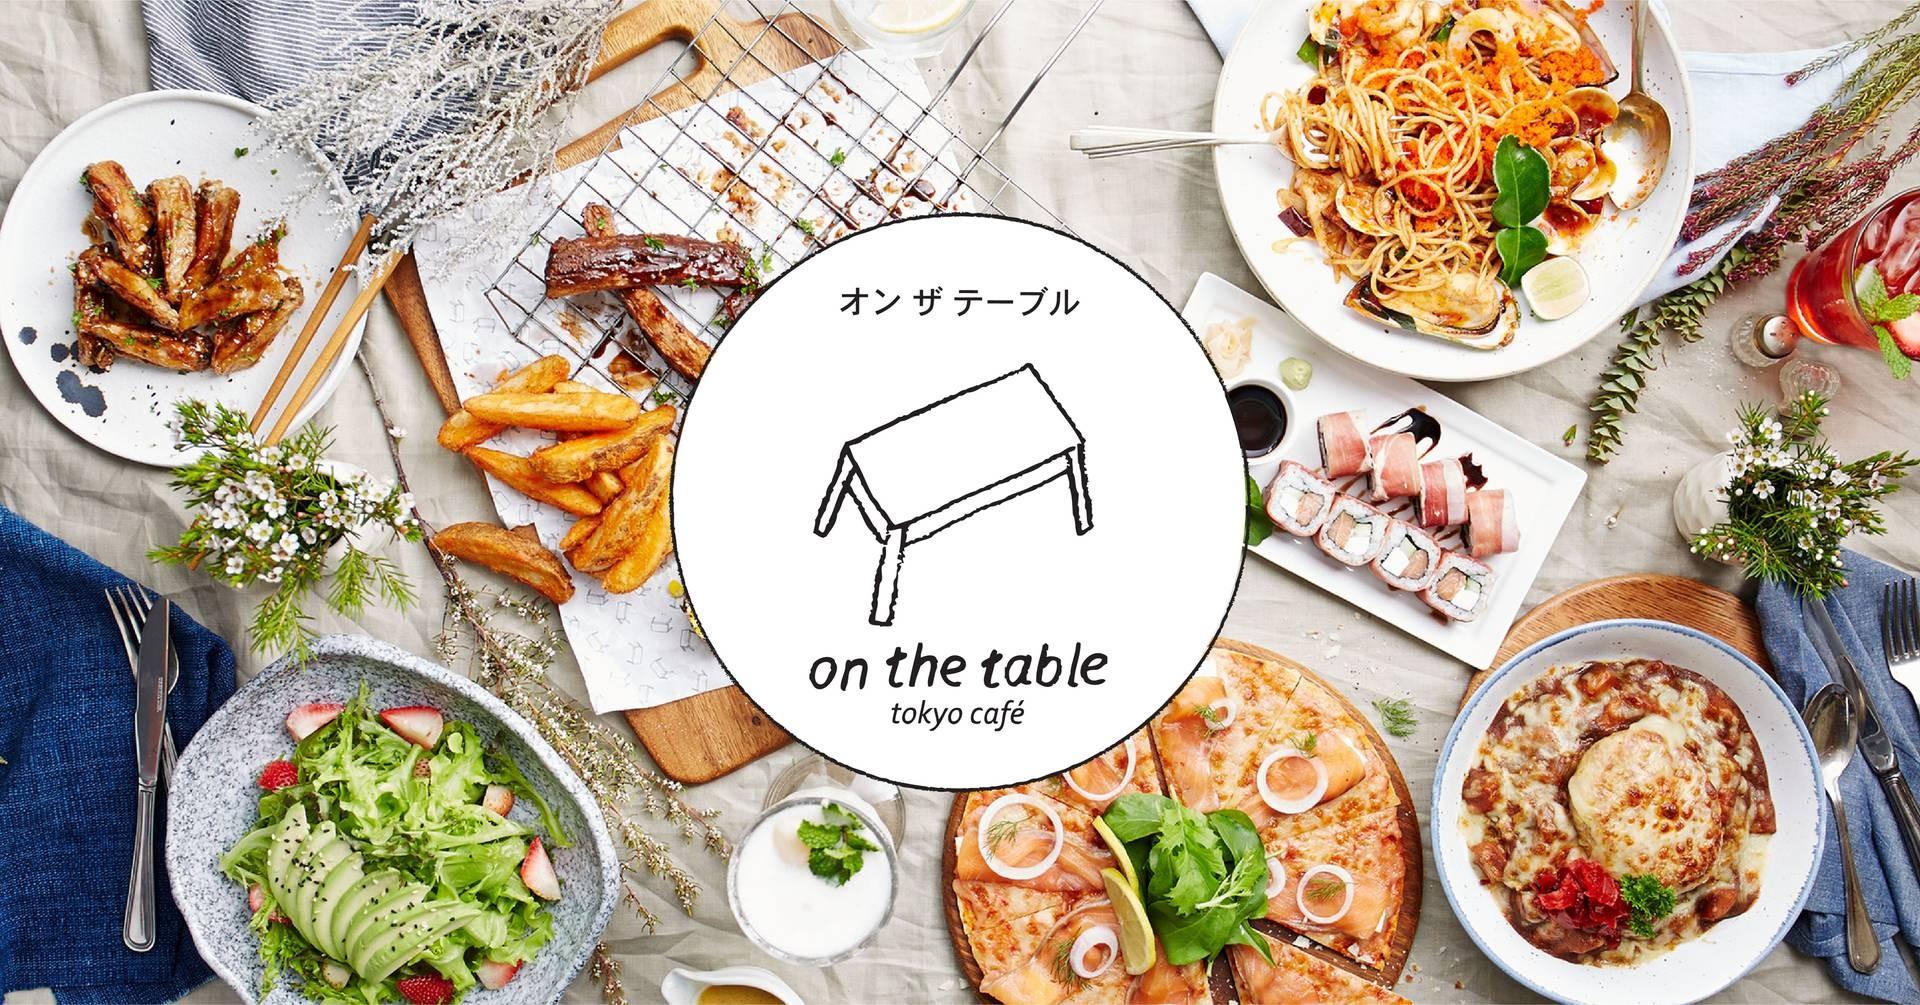 On The Table สยามเซ็นเตอร์